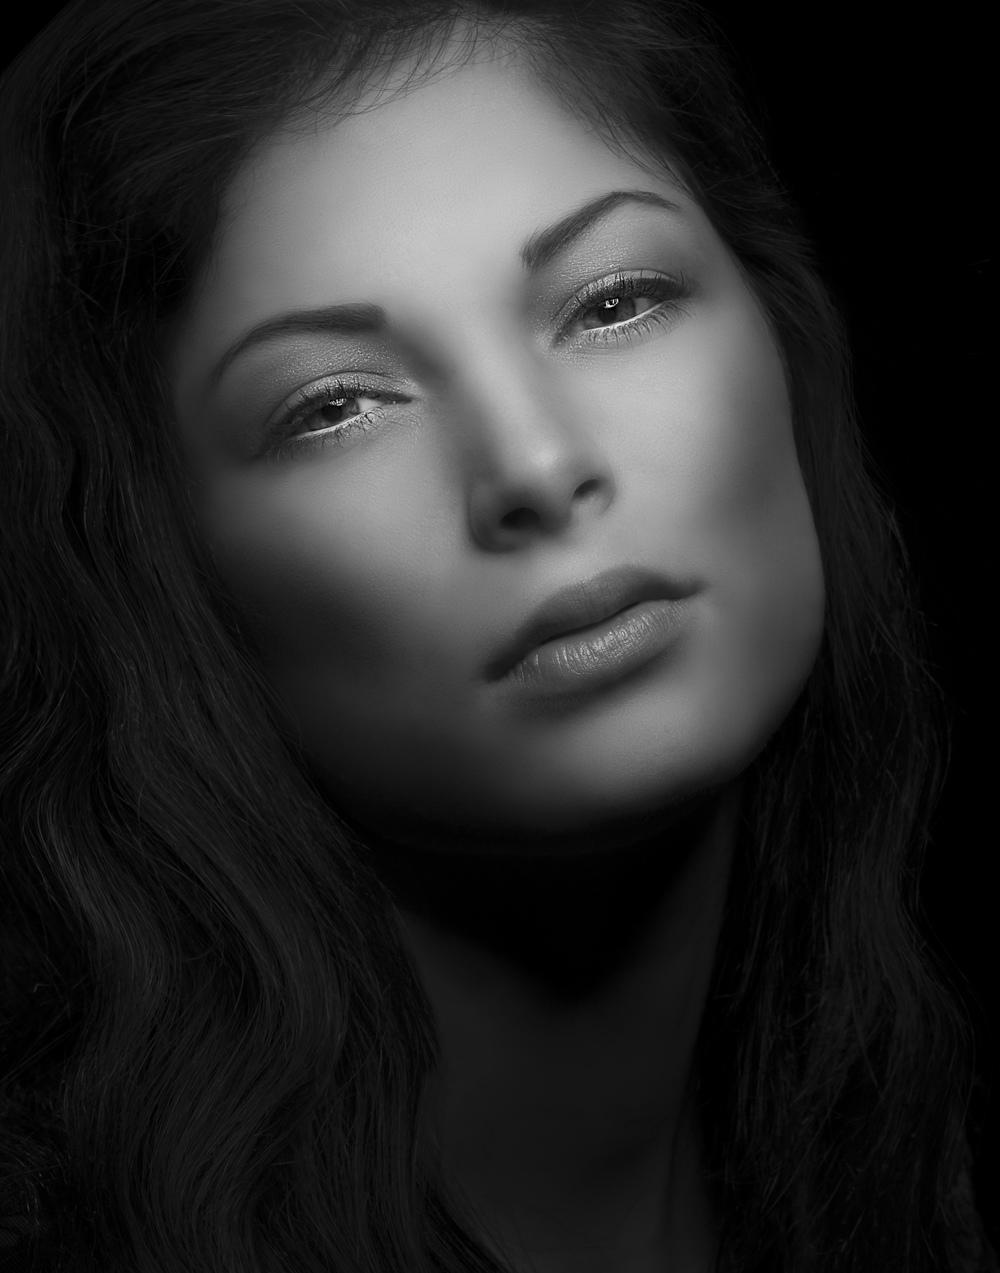 09-Reilly-Jessica-P4M5.jpg